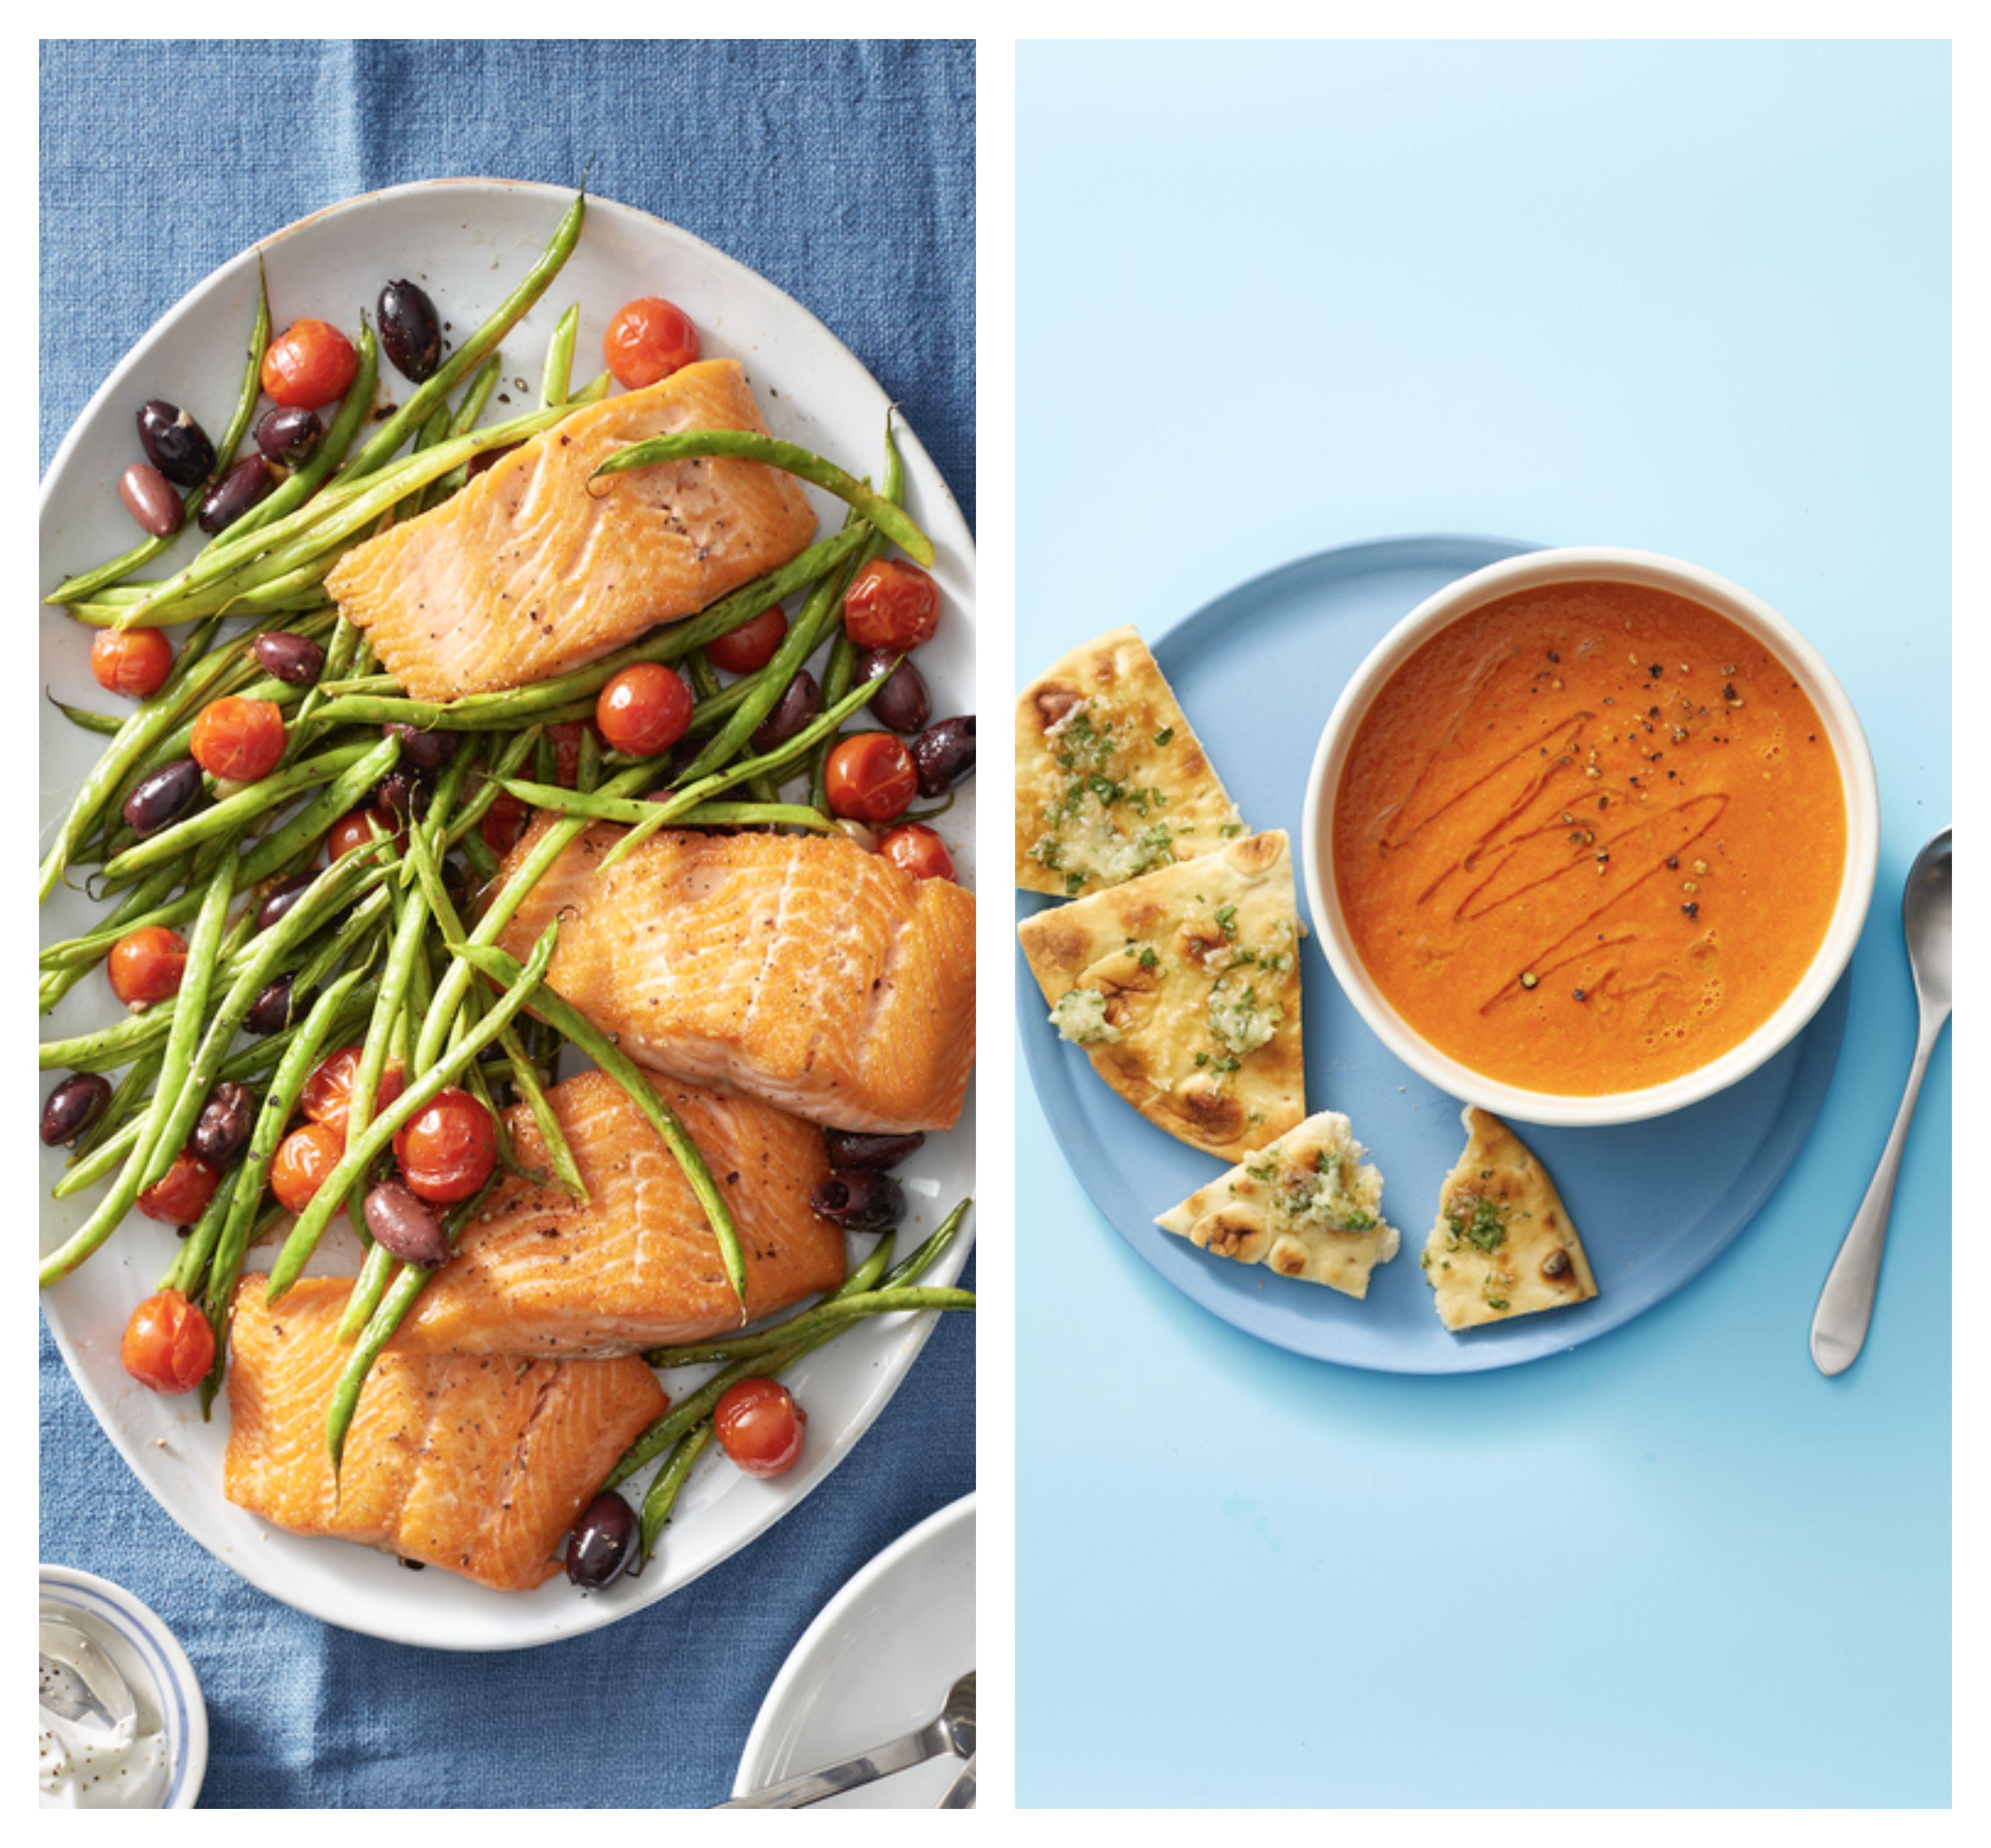 comida bajas calorias recetas